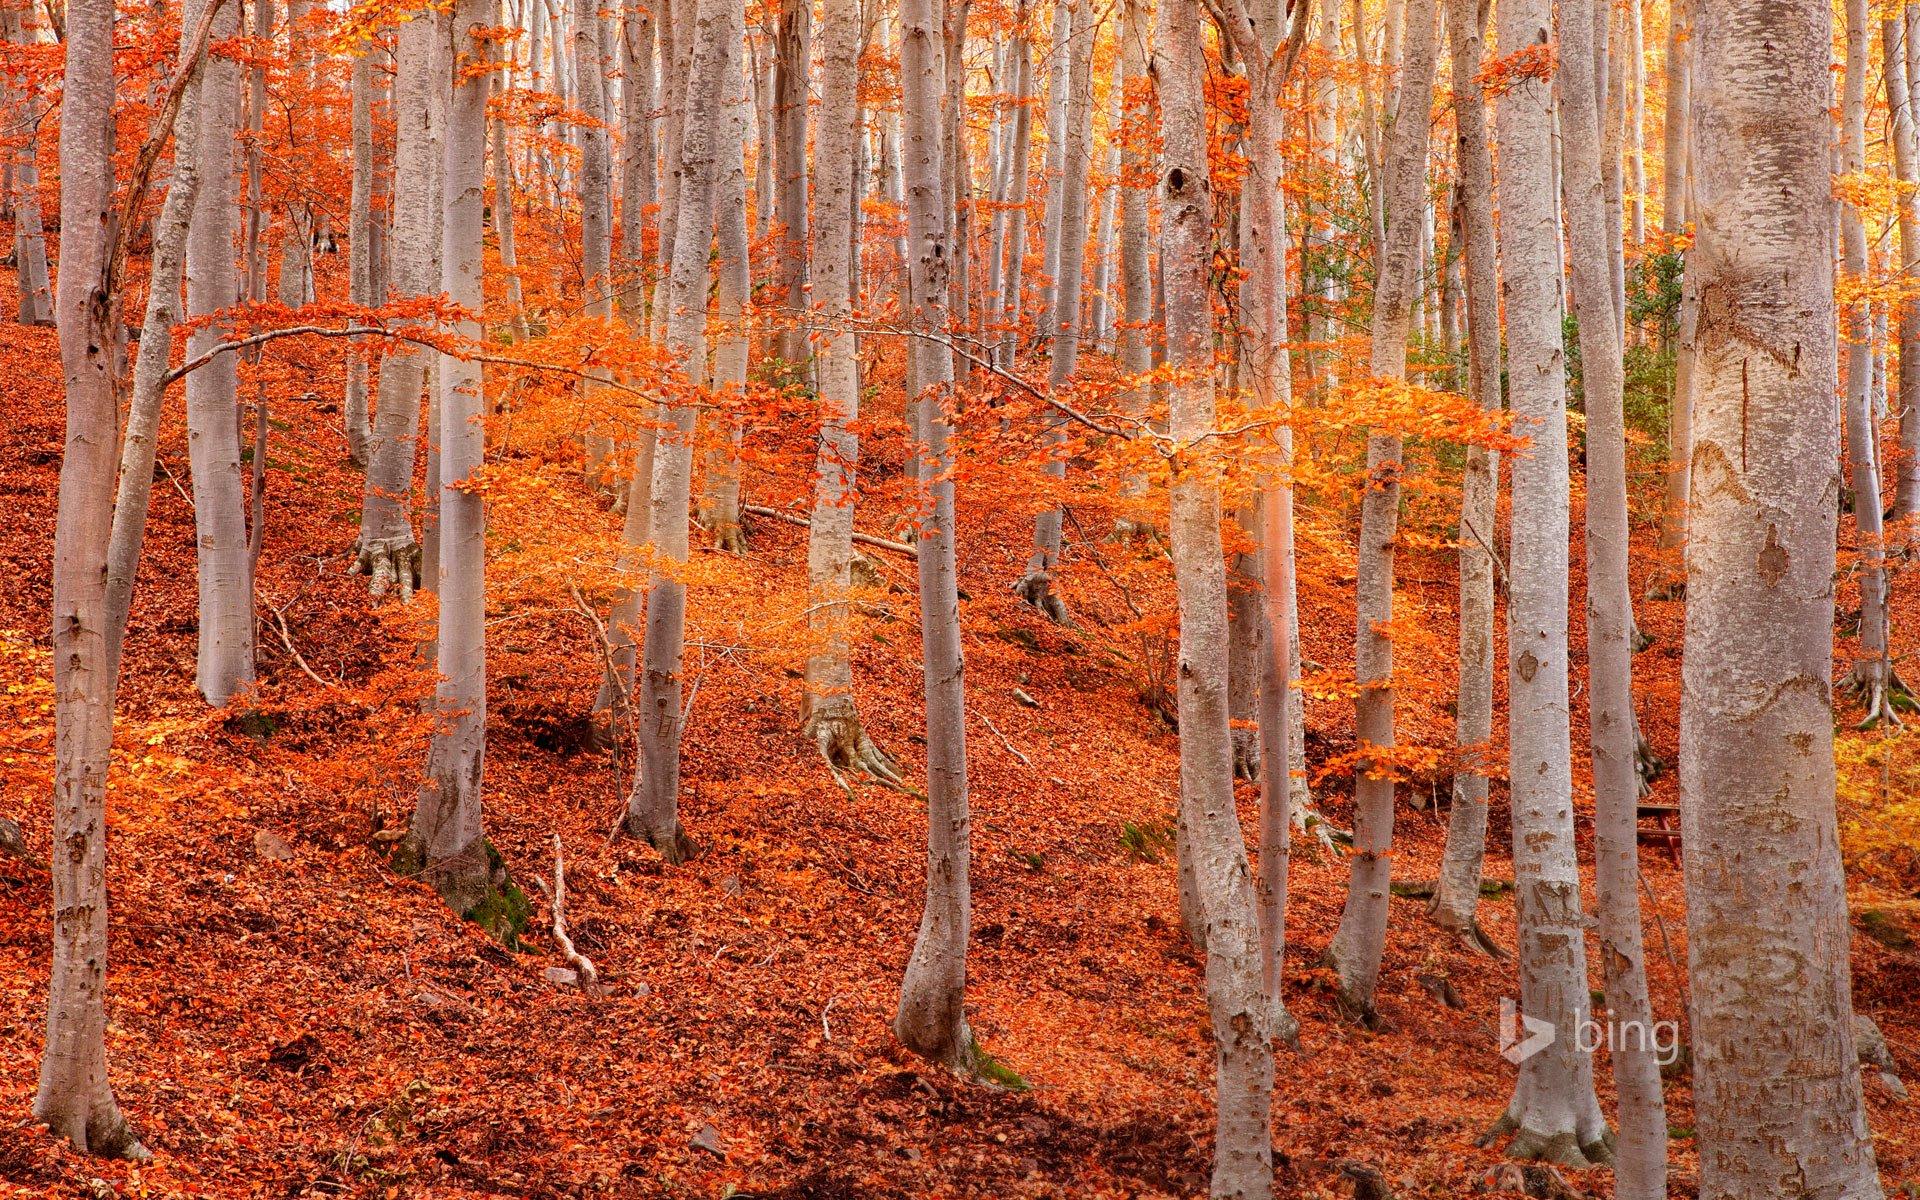 Fall Autumn Iphone Wallpaper Dehesa De Moncayo Natural Park Near Zaragoza Spain Hd